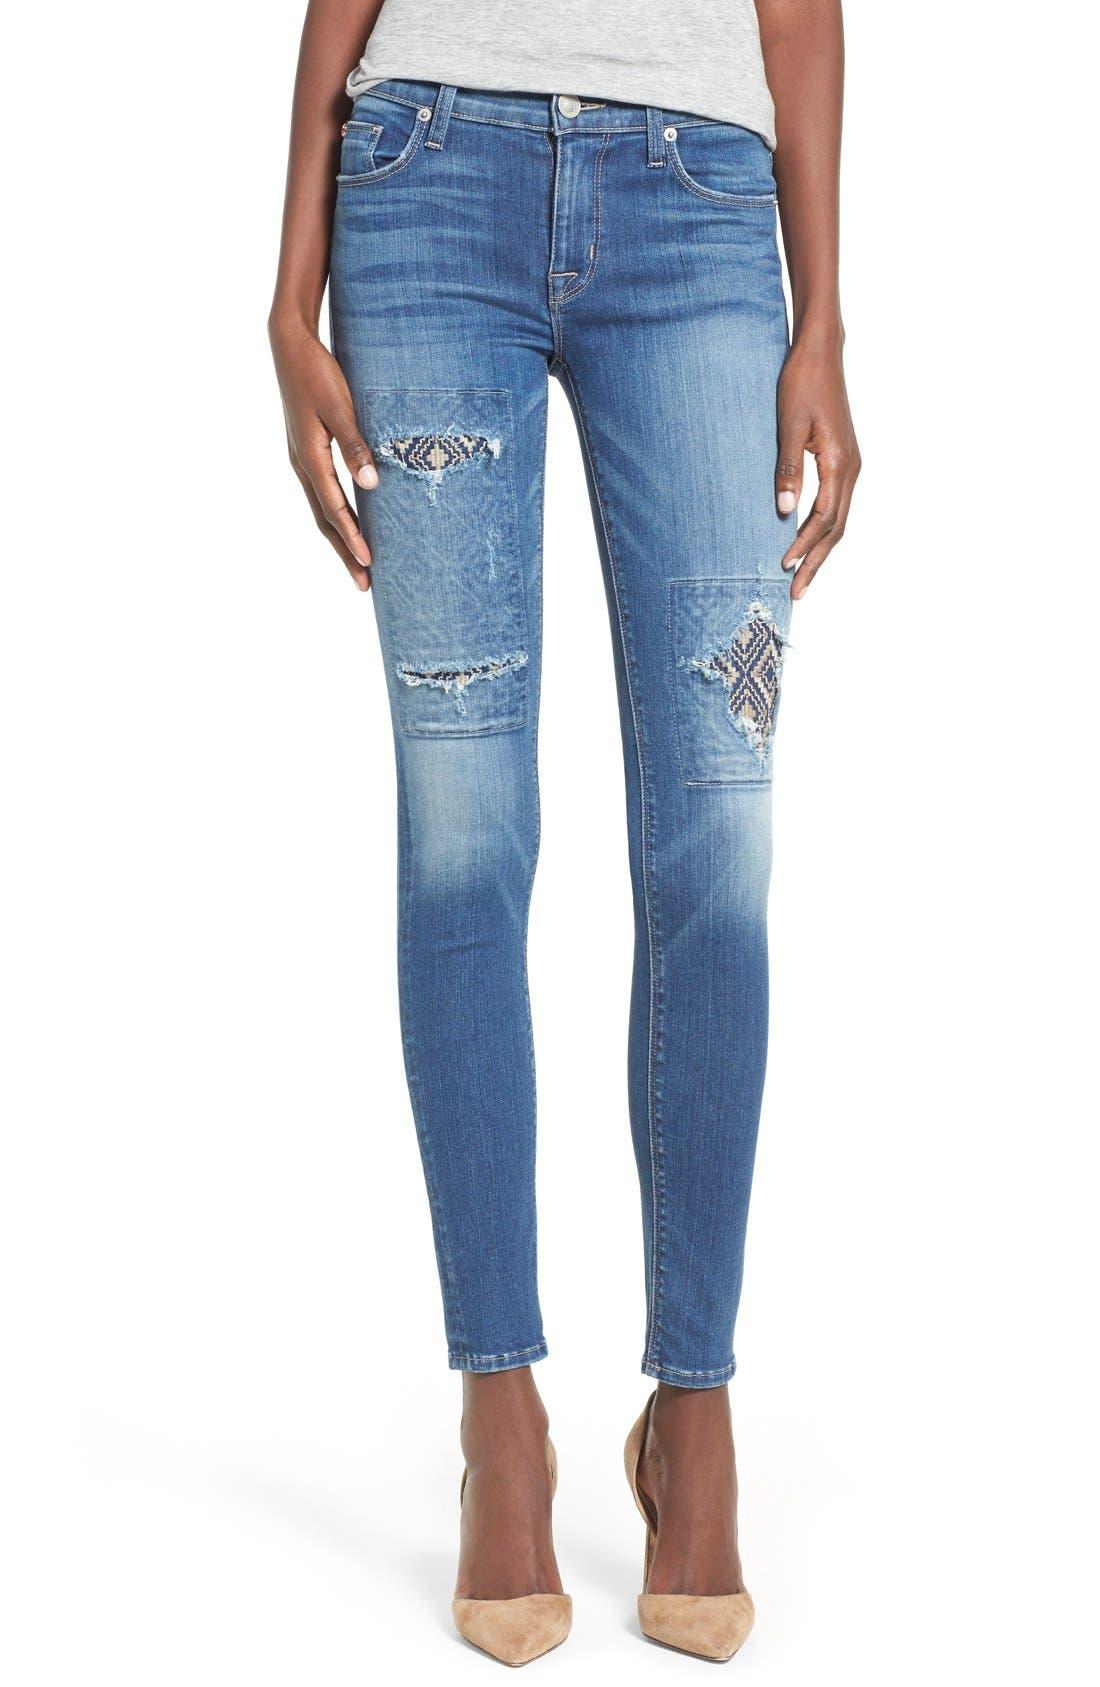 Alternate Image 1 Selected - Hudson Jeans 'Nico' Super Skinny Jeans